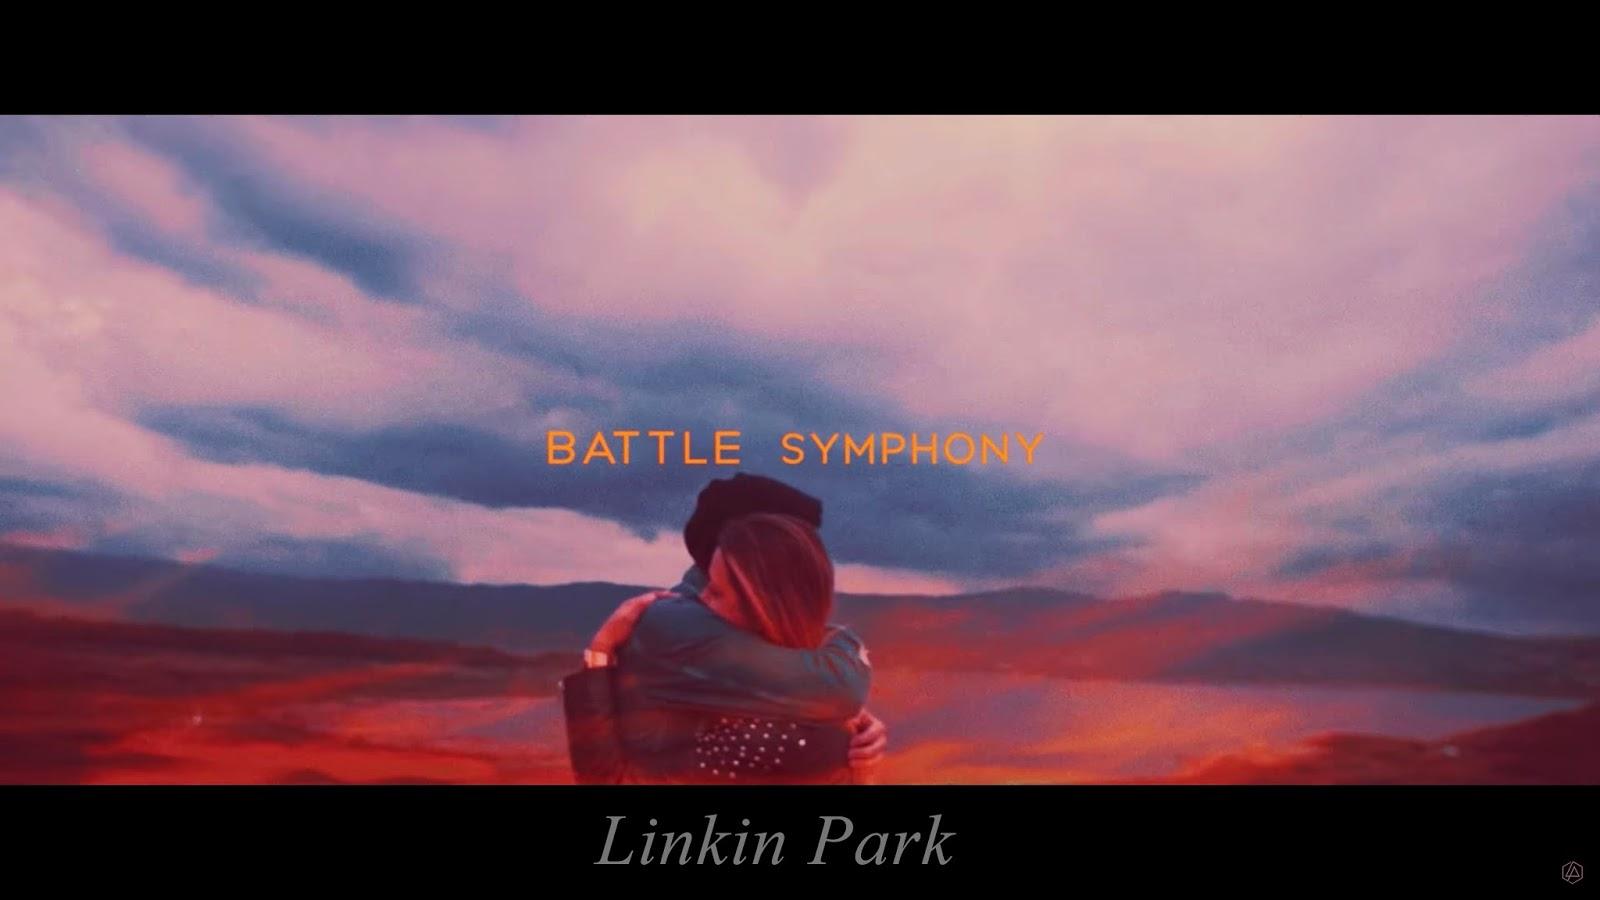 Guitar Chords Linkin Park - Battle Symphony - Lyrics and